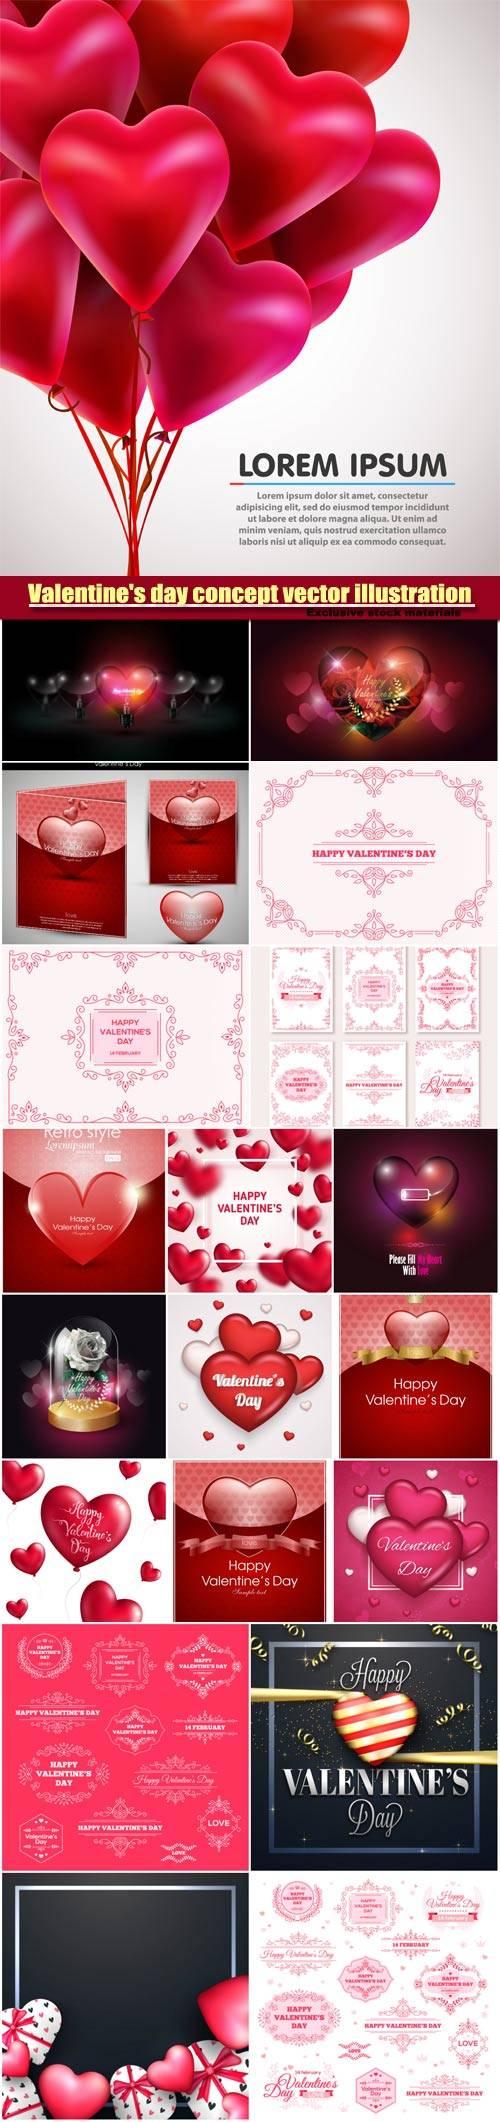 Valentine's day concept vector illustration